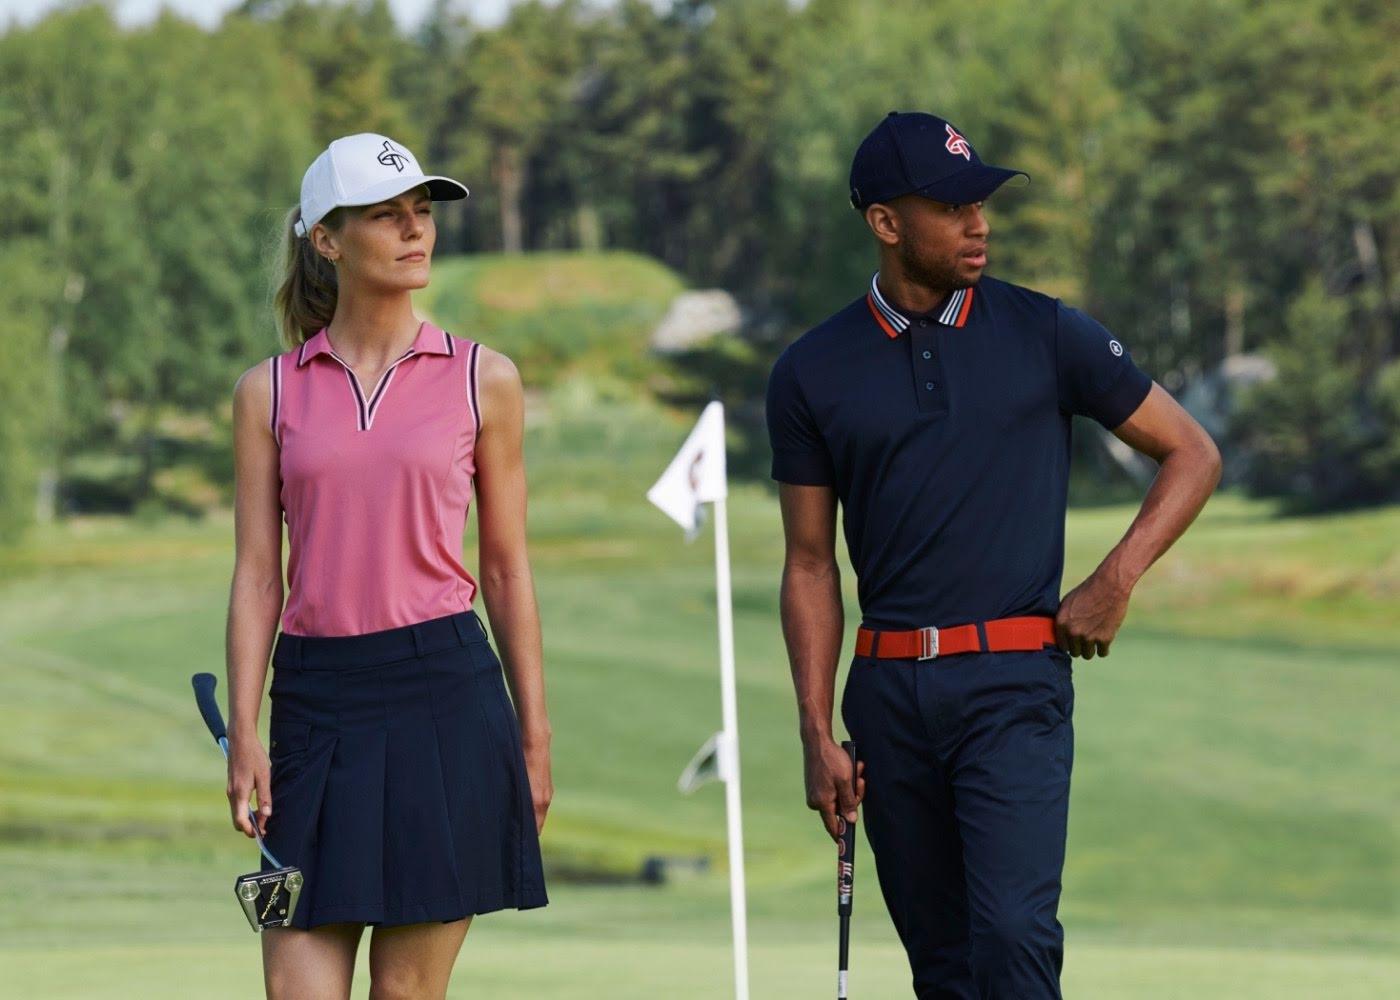 Golfkläder Cross Sportswear